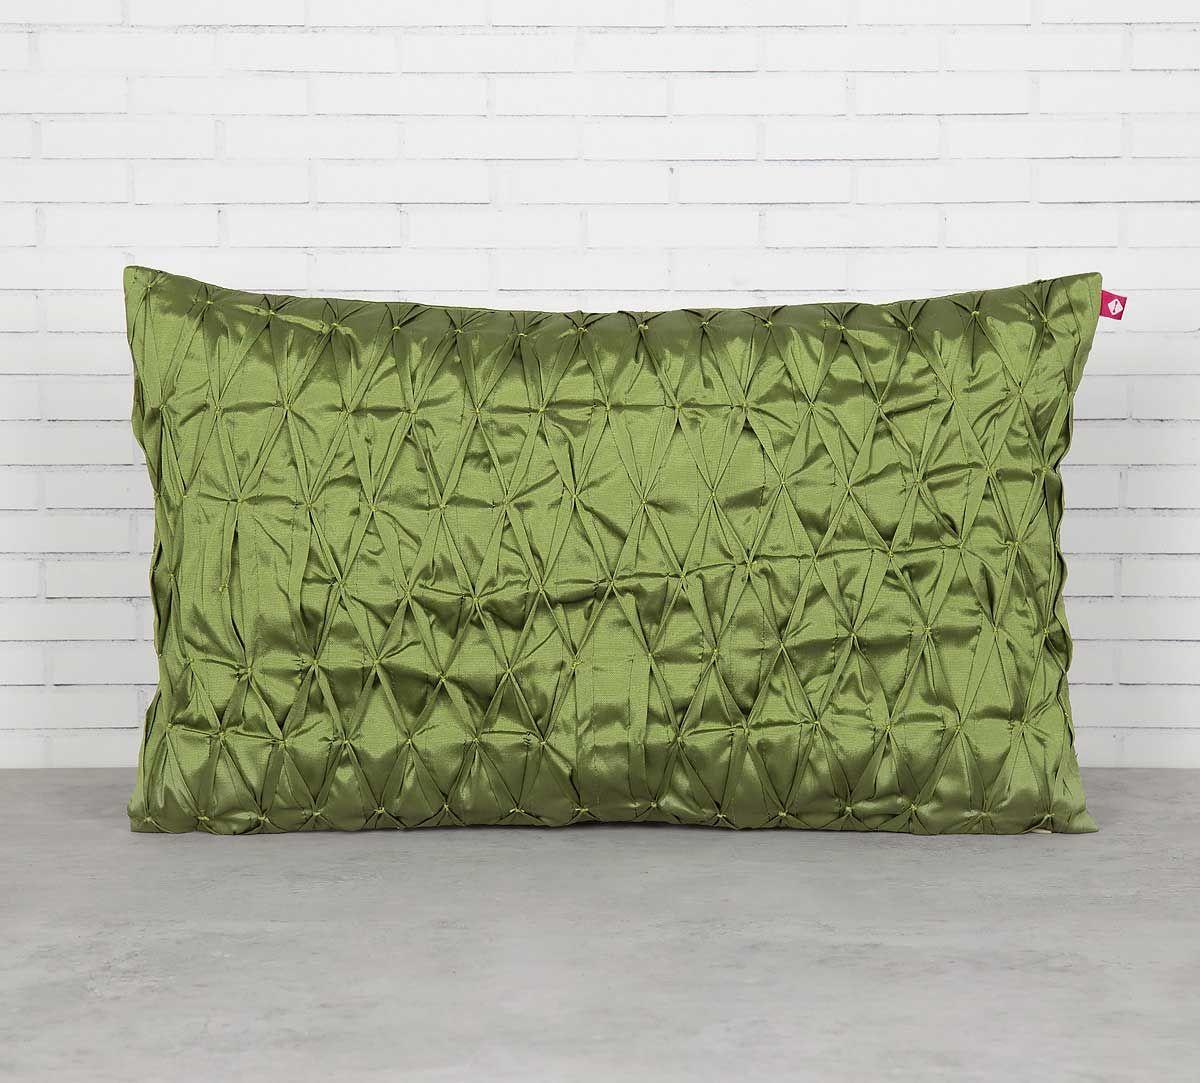 India Circus Green Pucker Rectangle Satin Blend Cushion Cover